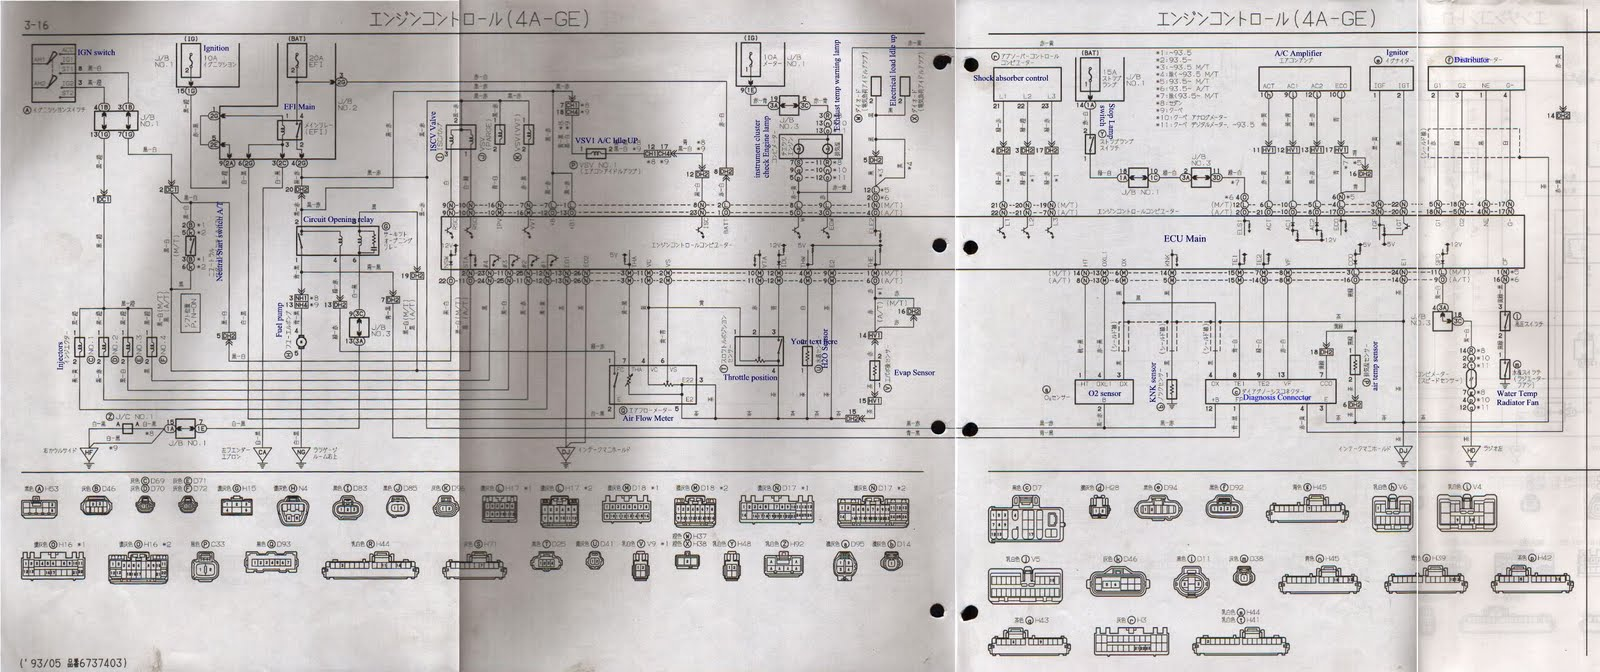 toyota 4runner trailer wiring diagram electric breakaway blacktop great installation of 4age data rh 7 14 reisen fuer meister de tacoma pickup harness